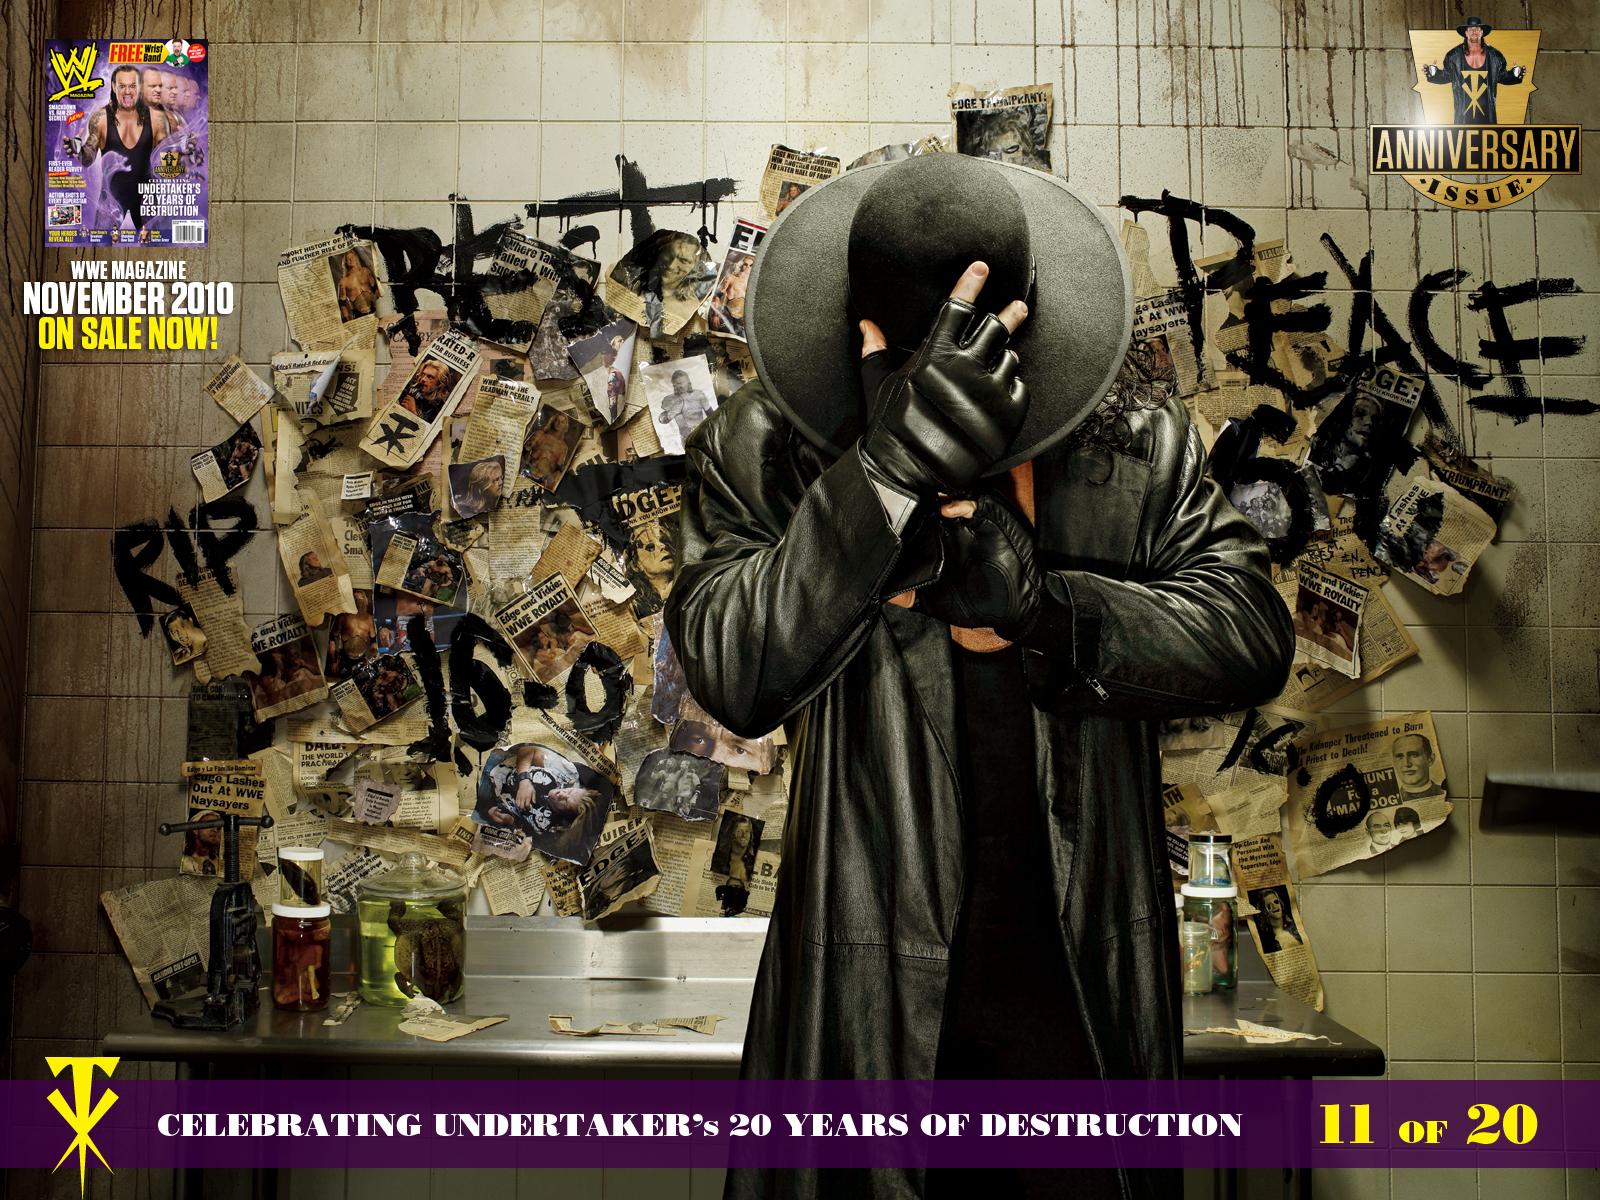 http://1.bp.blogspot.com/-lpywSaIZCPU/TjhKiPSfjzI/AAAAAAAAAis/GomN5Q-si_0/s1600/Undertaker-Wallpaper-undertaker-16383635-1600-1200.jpg